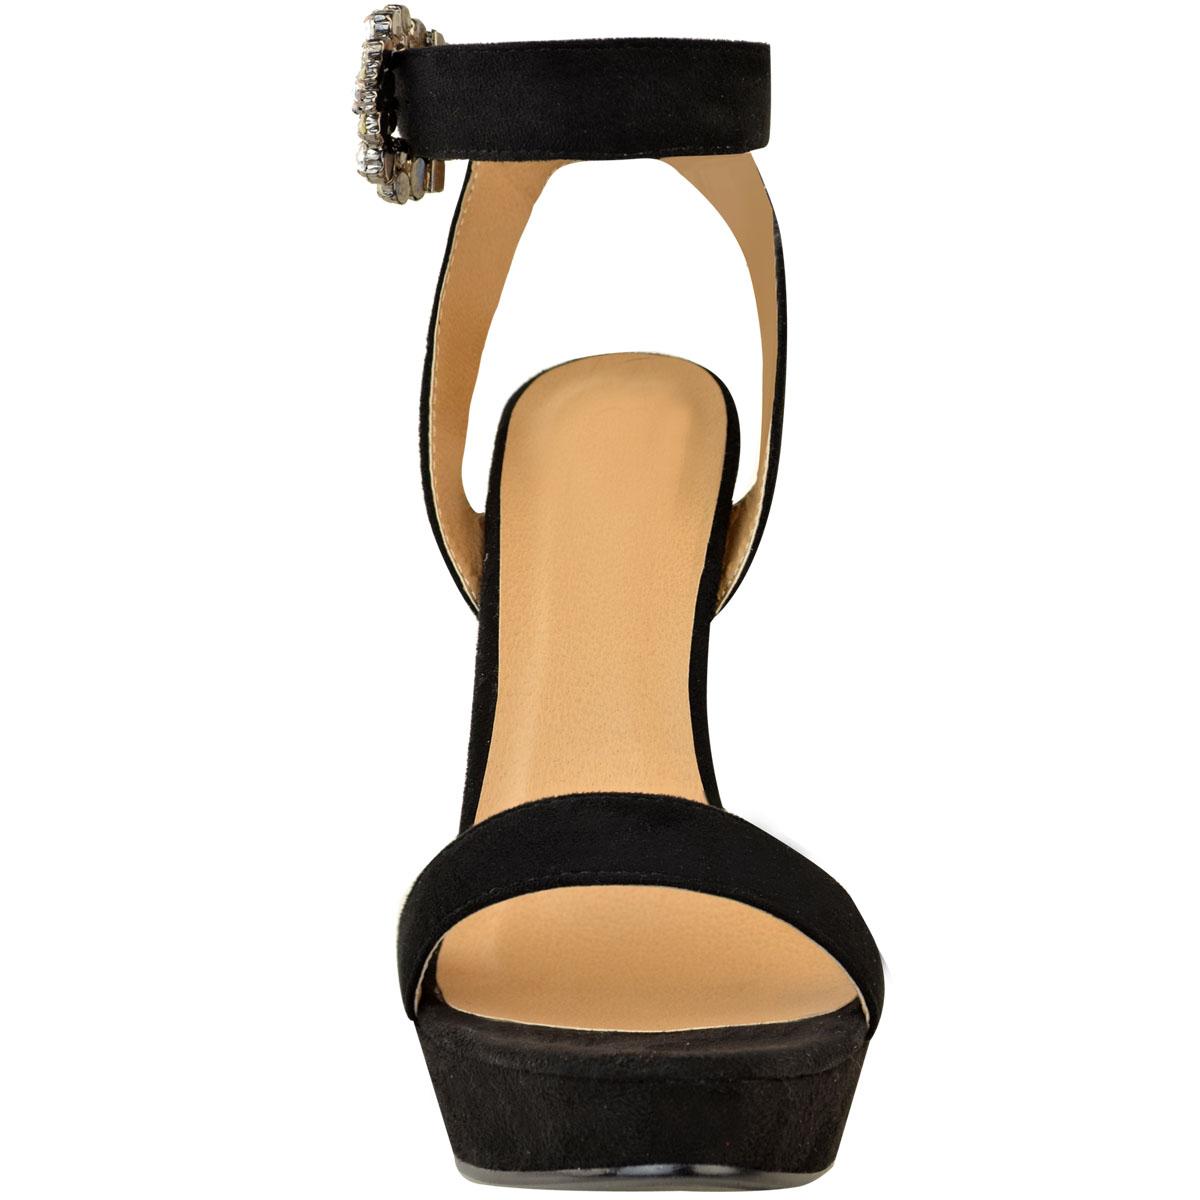 Womens-Ladies-Stilettos-High-Heels-Strappy-Platforms-Sandals-Diamante-Shoes-Size thumbnail 33